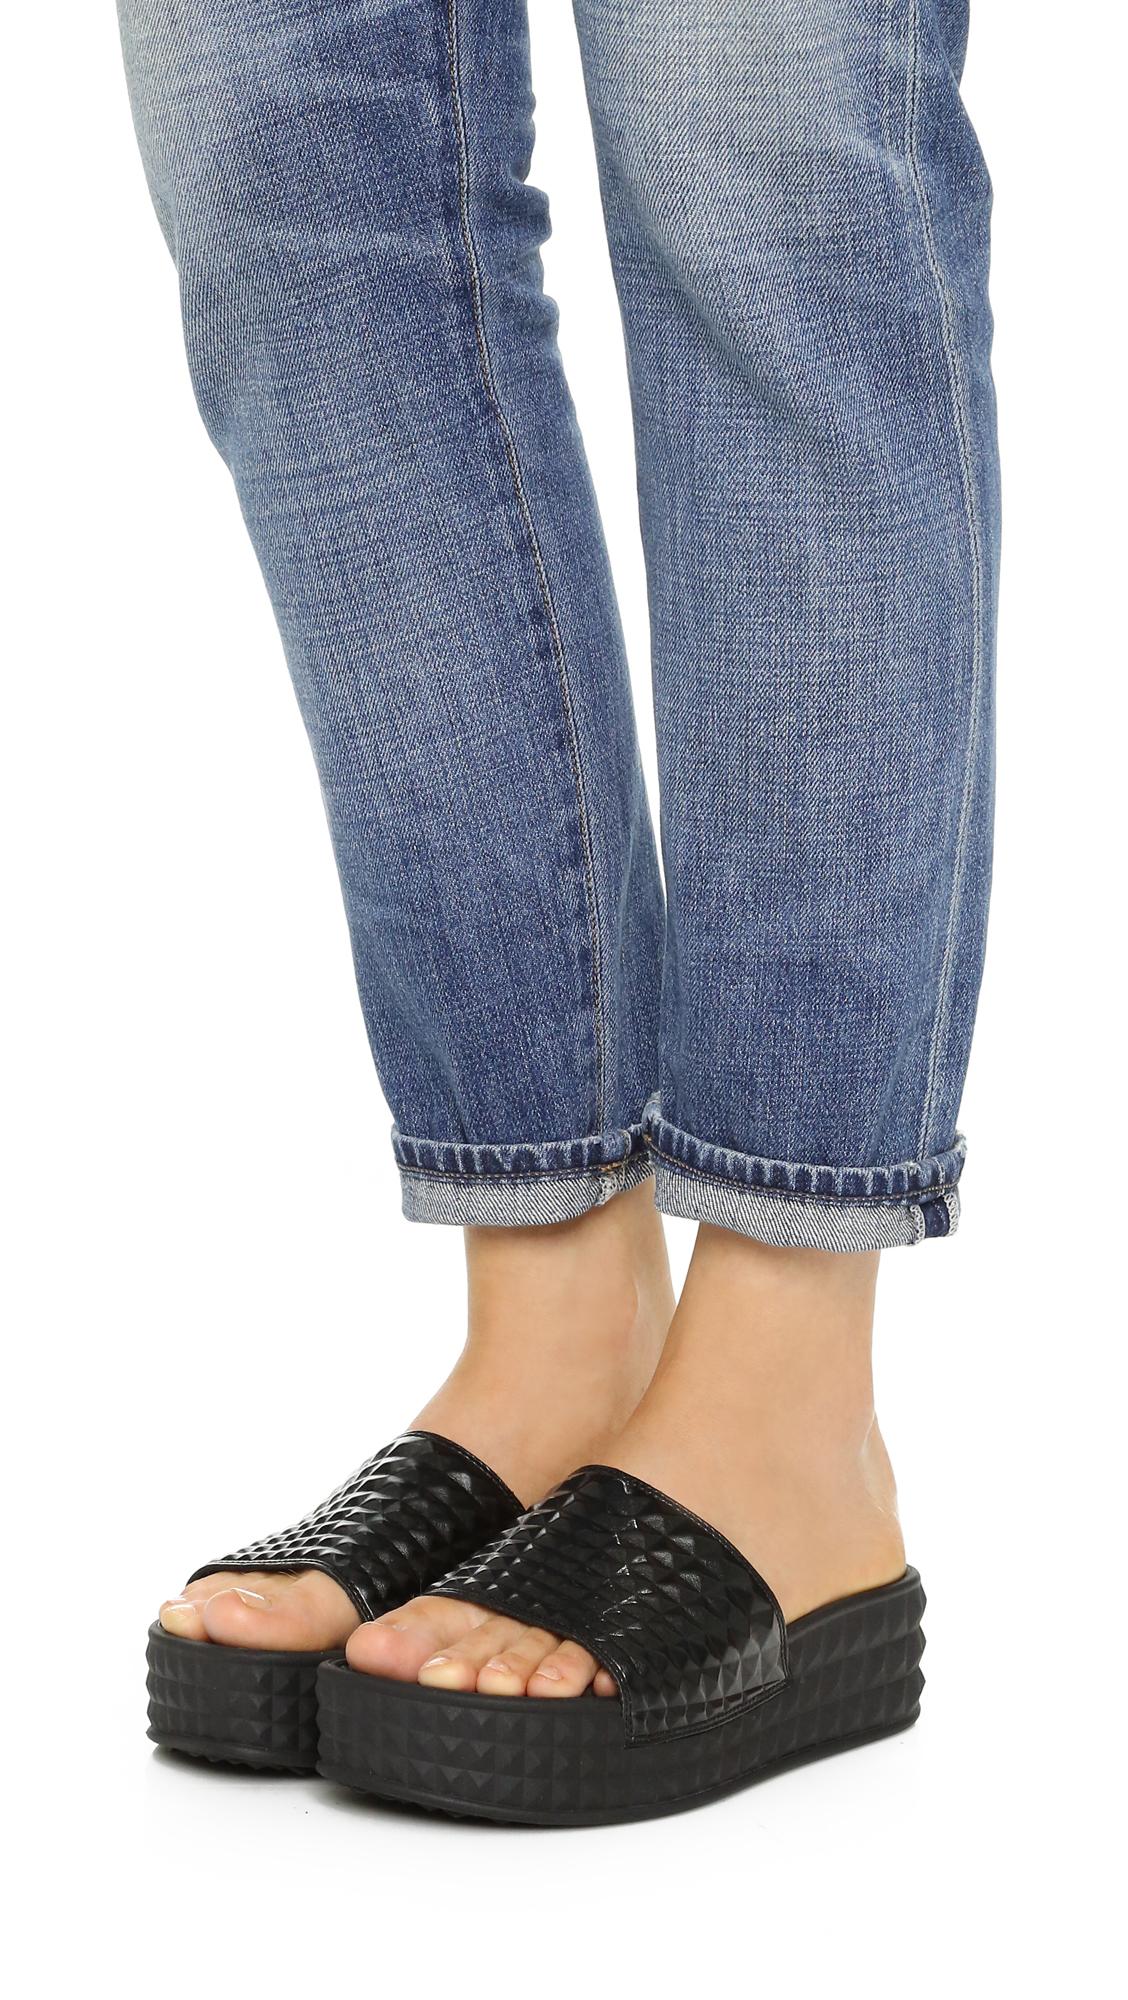 Ash Scream slide sandals